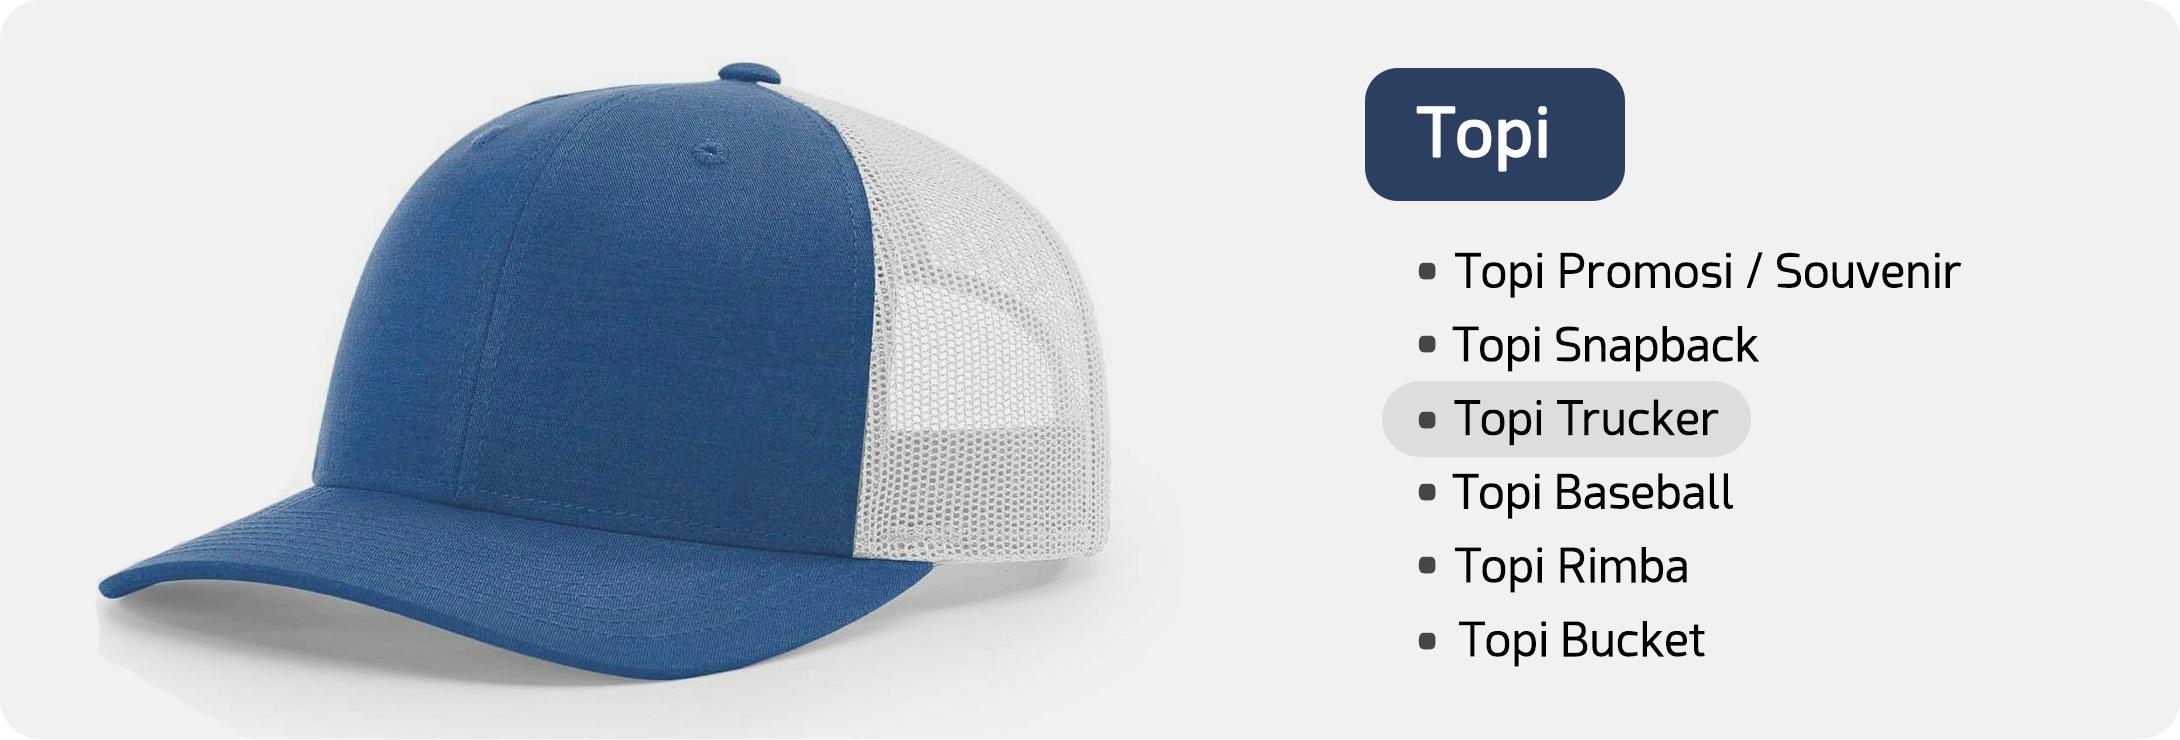 konveksi topi, konveksi topi jakarta, konveksi topi bandung, vendor topi, supplier topi, konveksi topi partai, pabrik topi